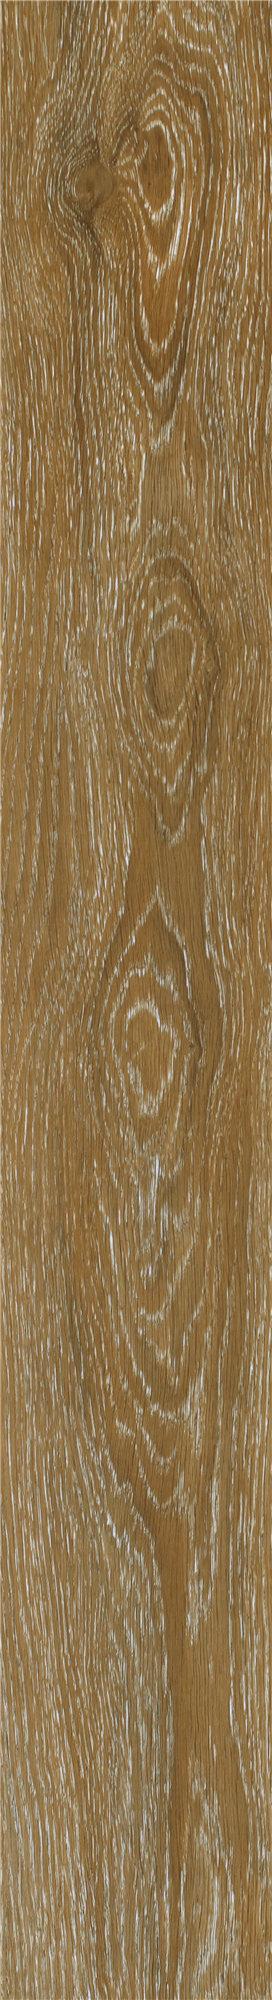 Ultrasurface Wholesale Glue Down Luxury Vinyl Plank Flooring Dryback LVT Flooring 7''x48'' 100m2MOQ